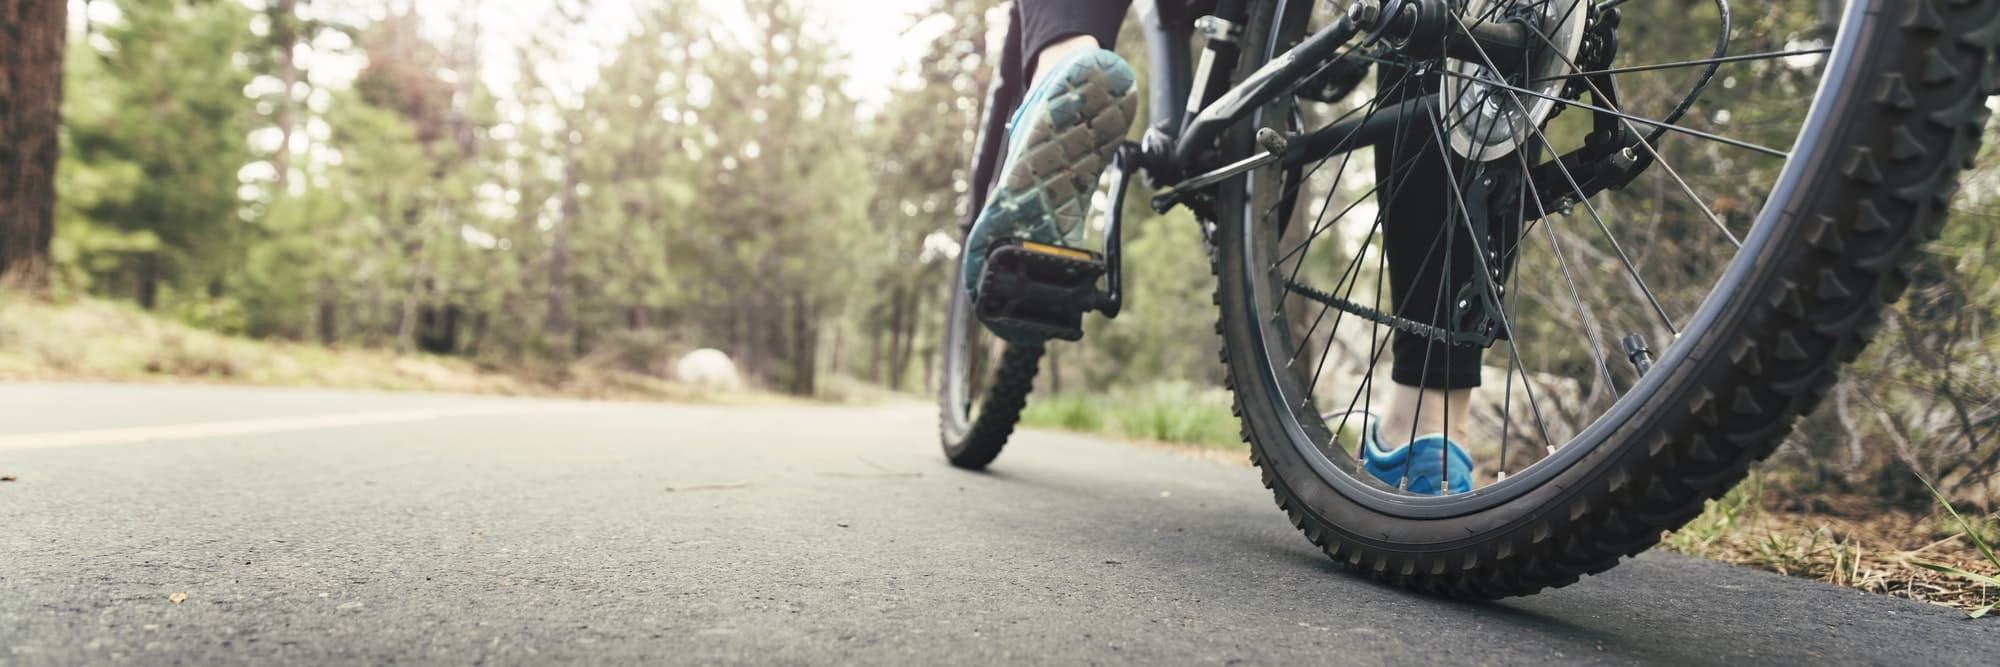 Fahrrad fahren in schöner Natur